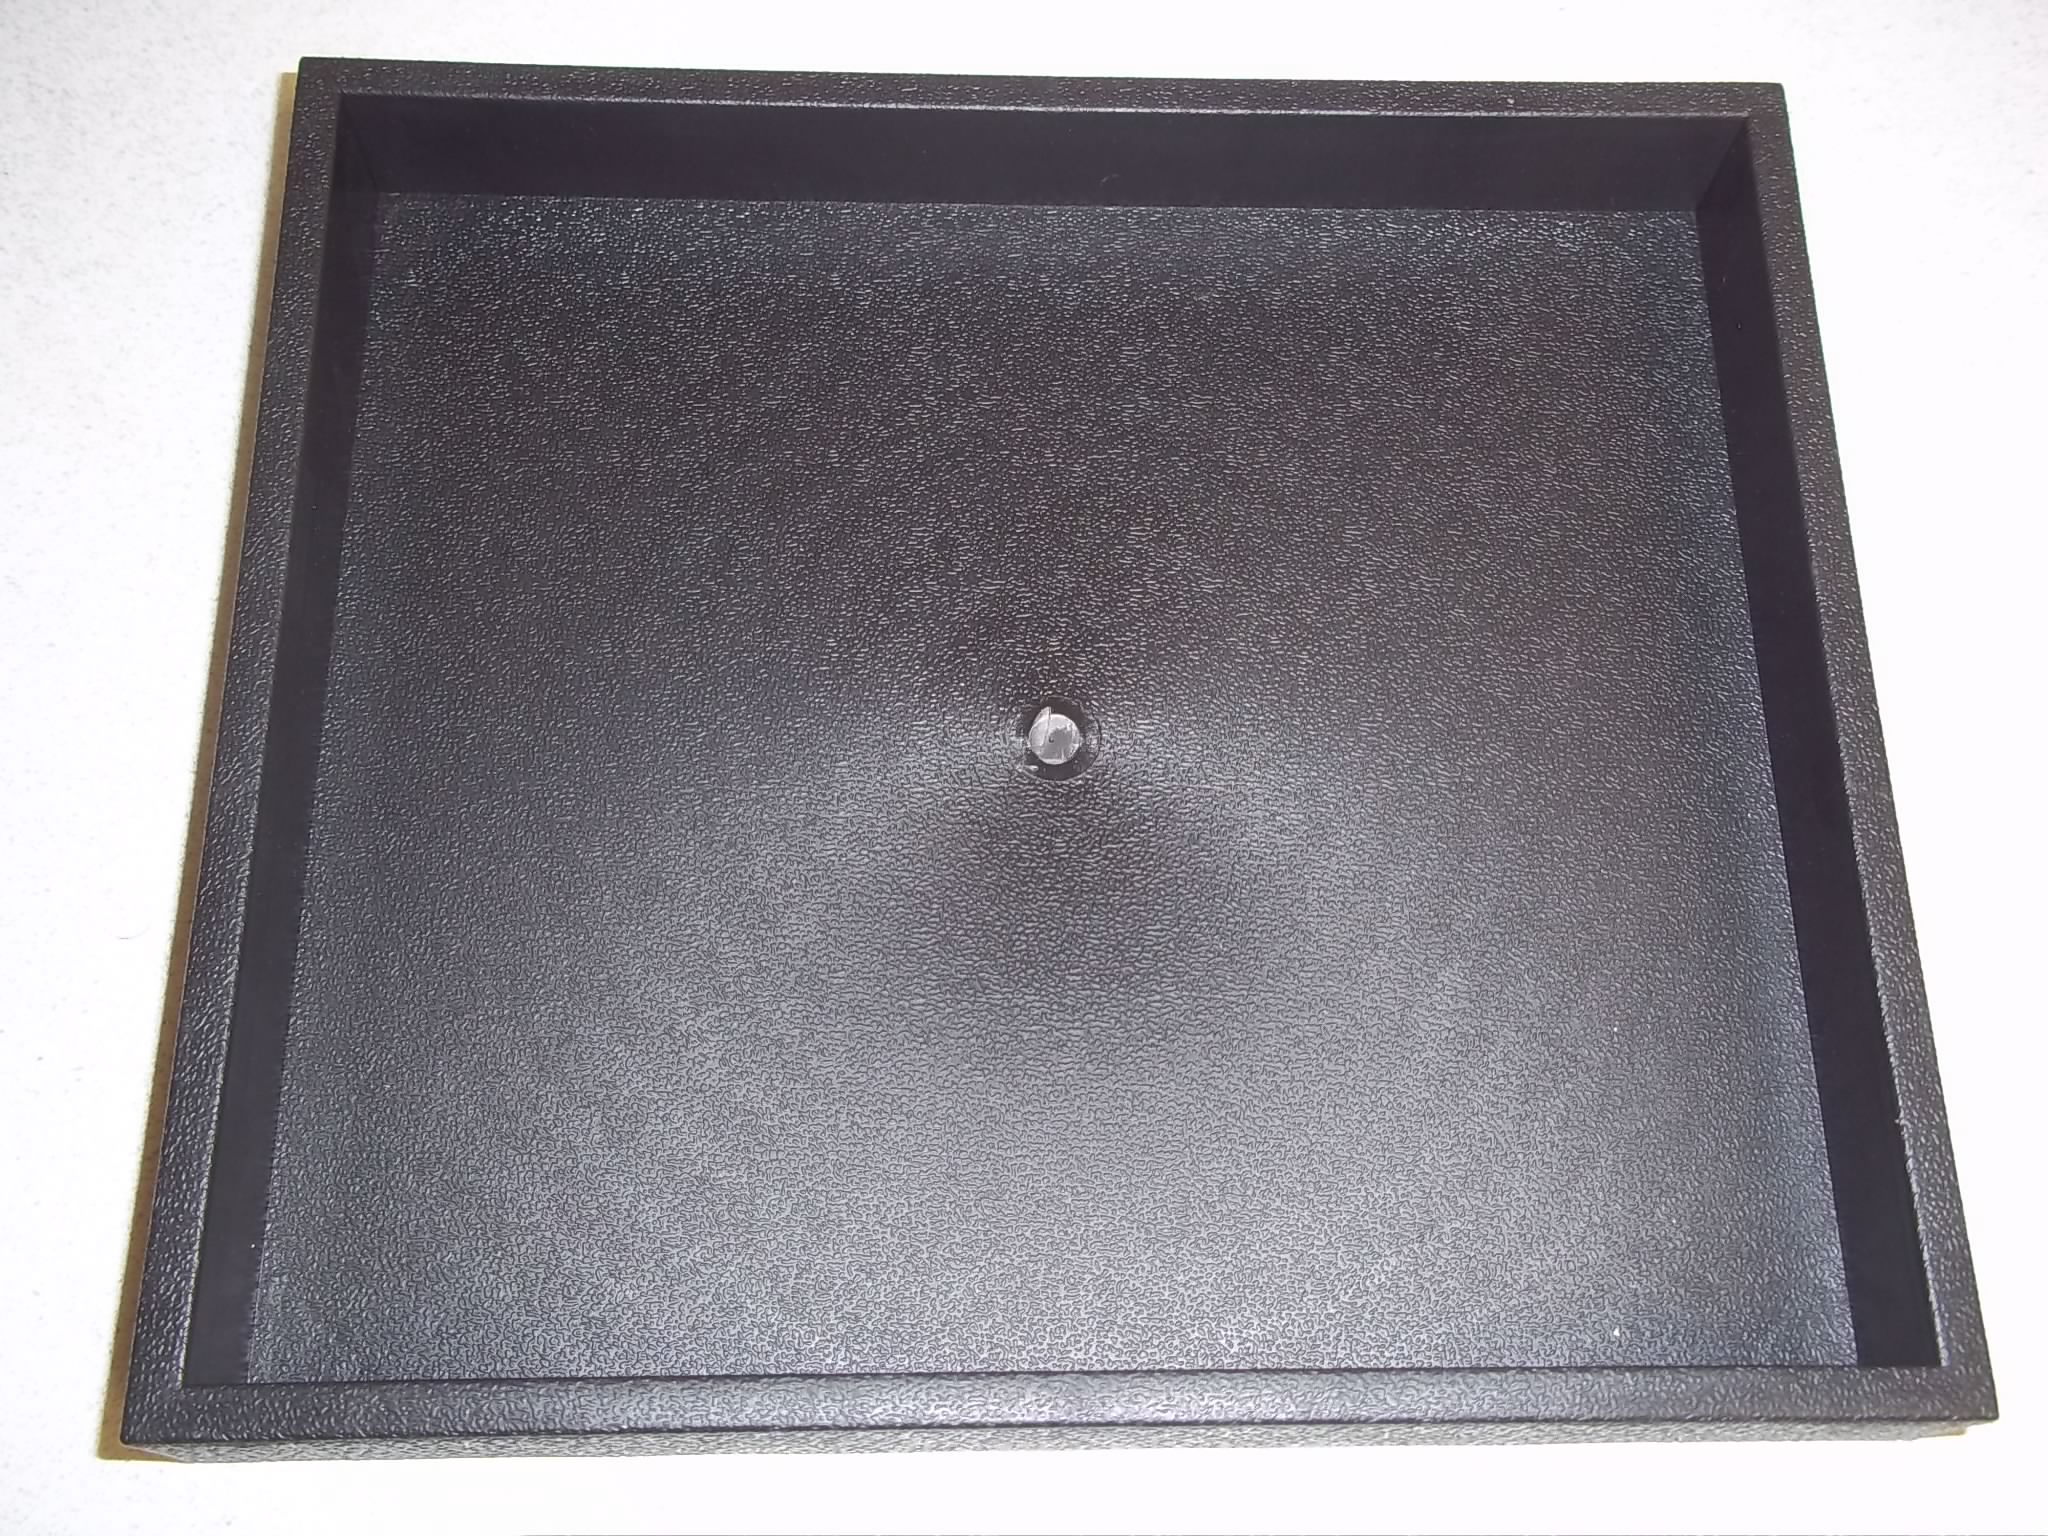 TR530 1/2 Size Black Plastic Display Tray